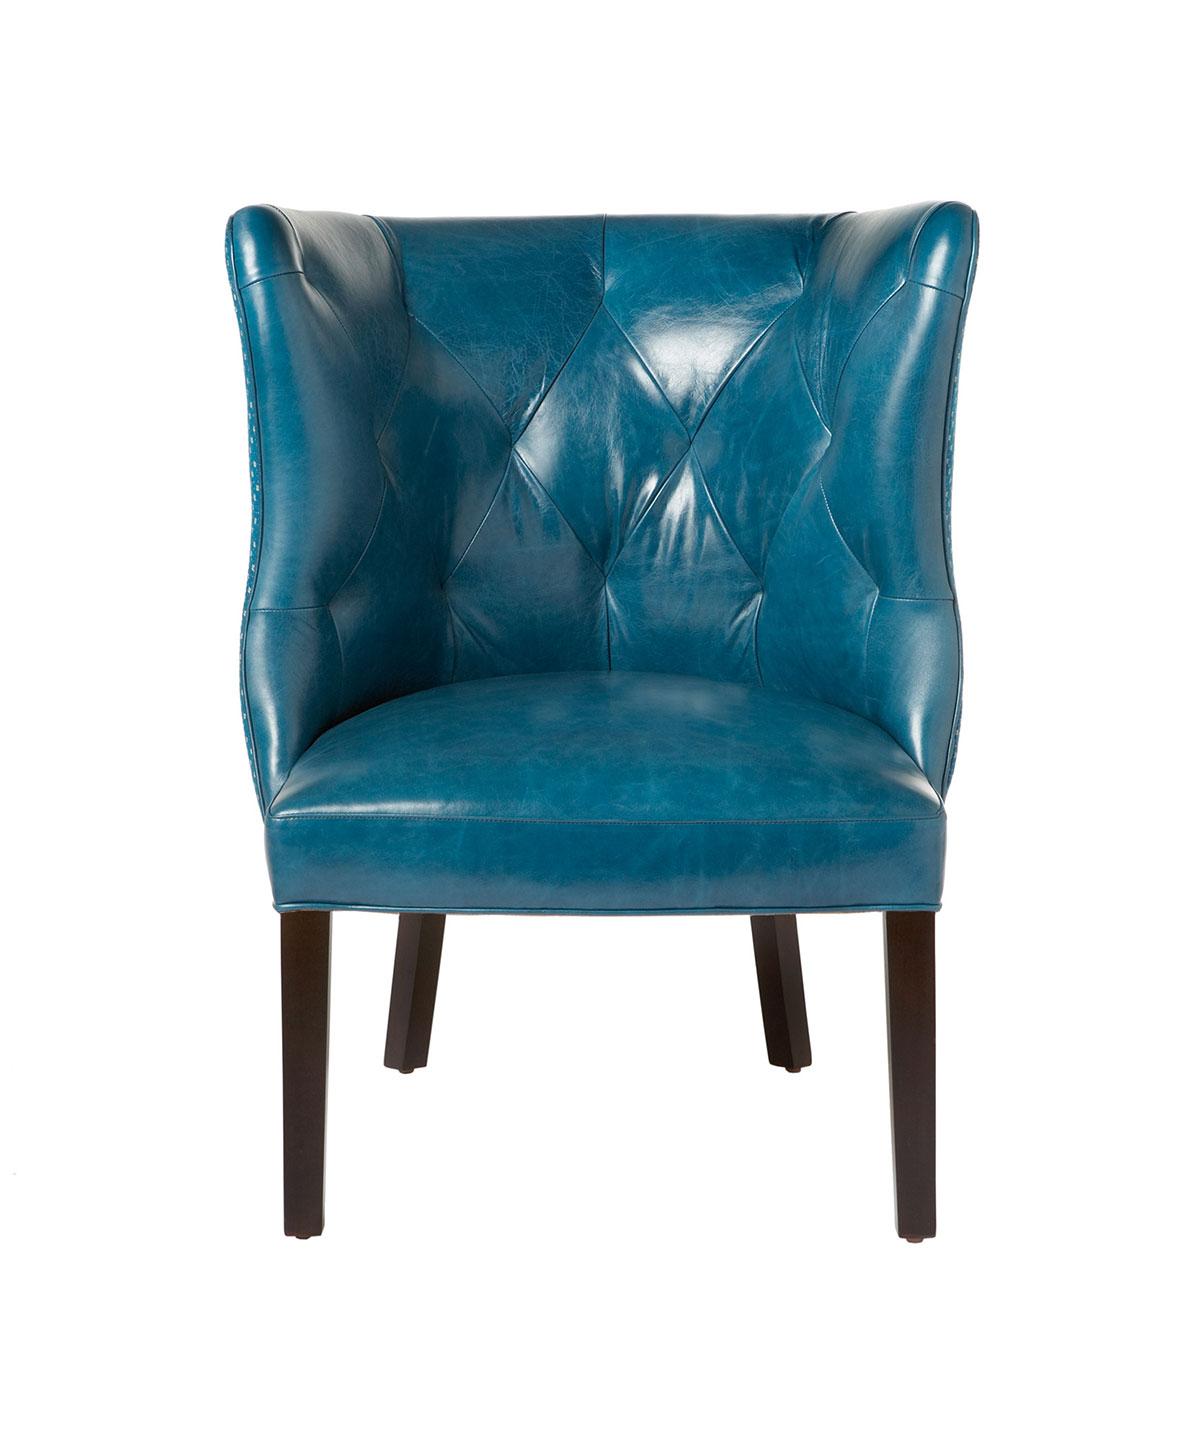 Goodman Leather Chair